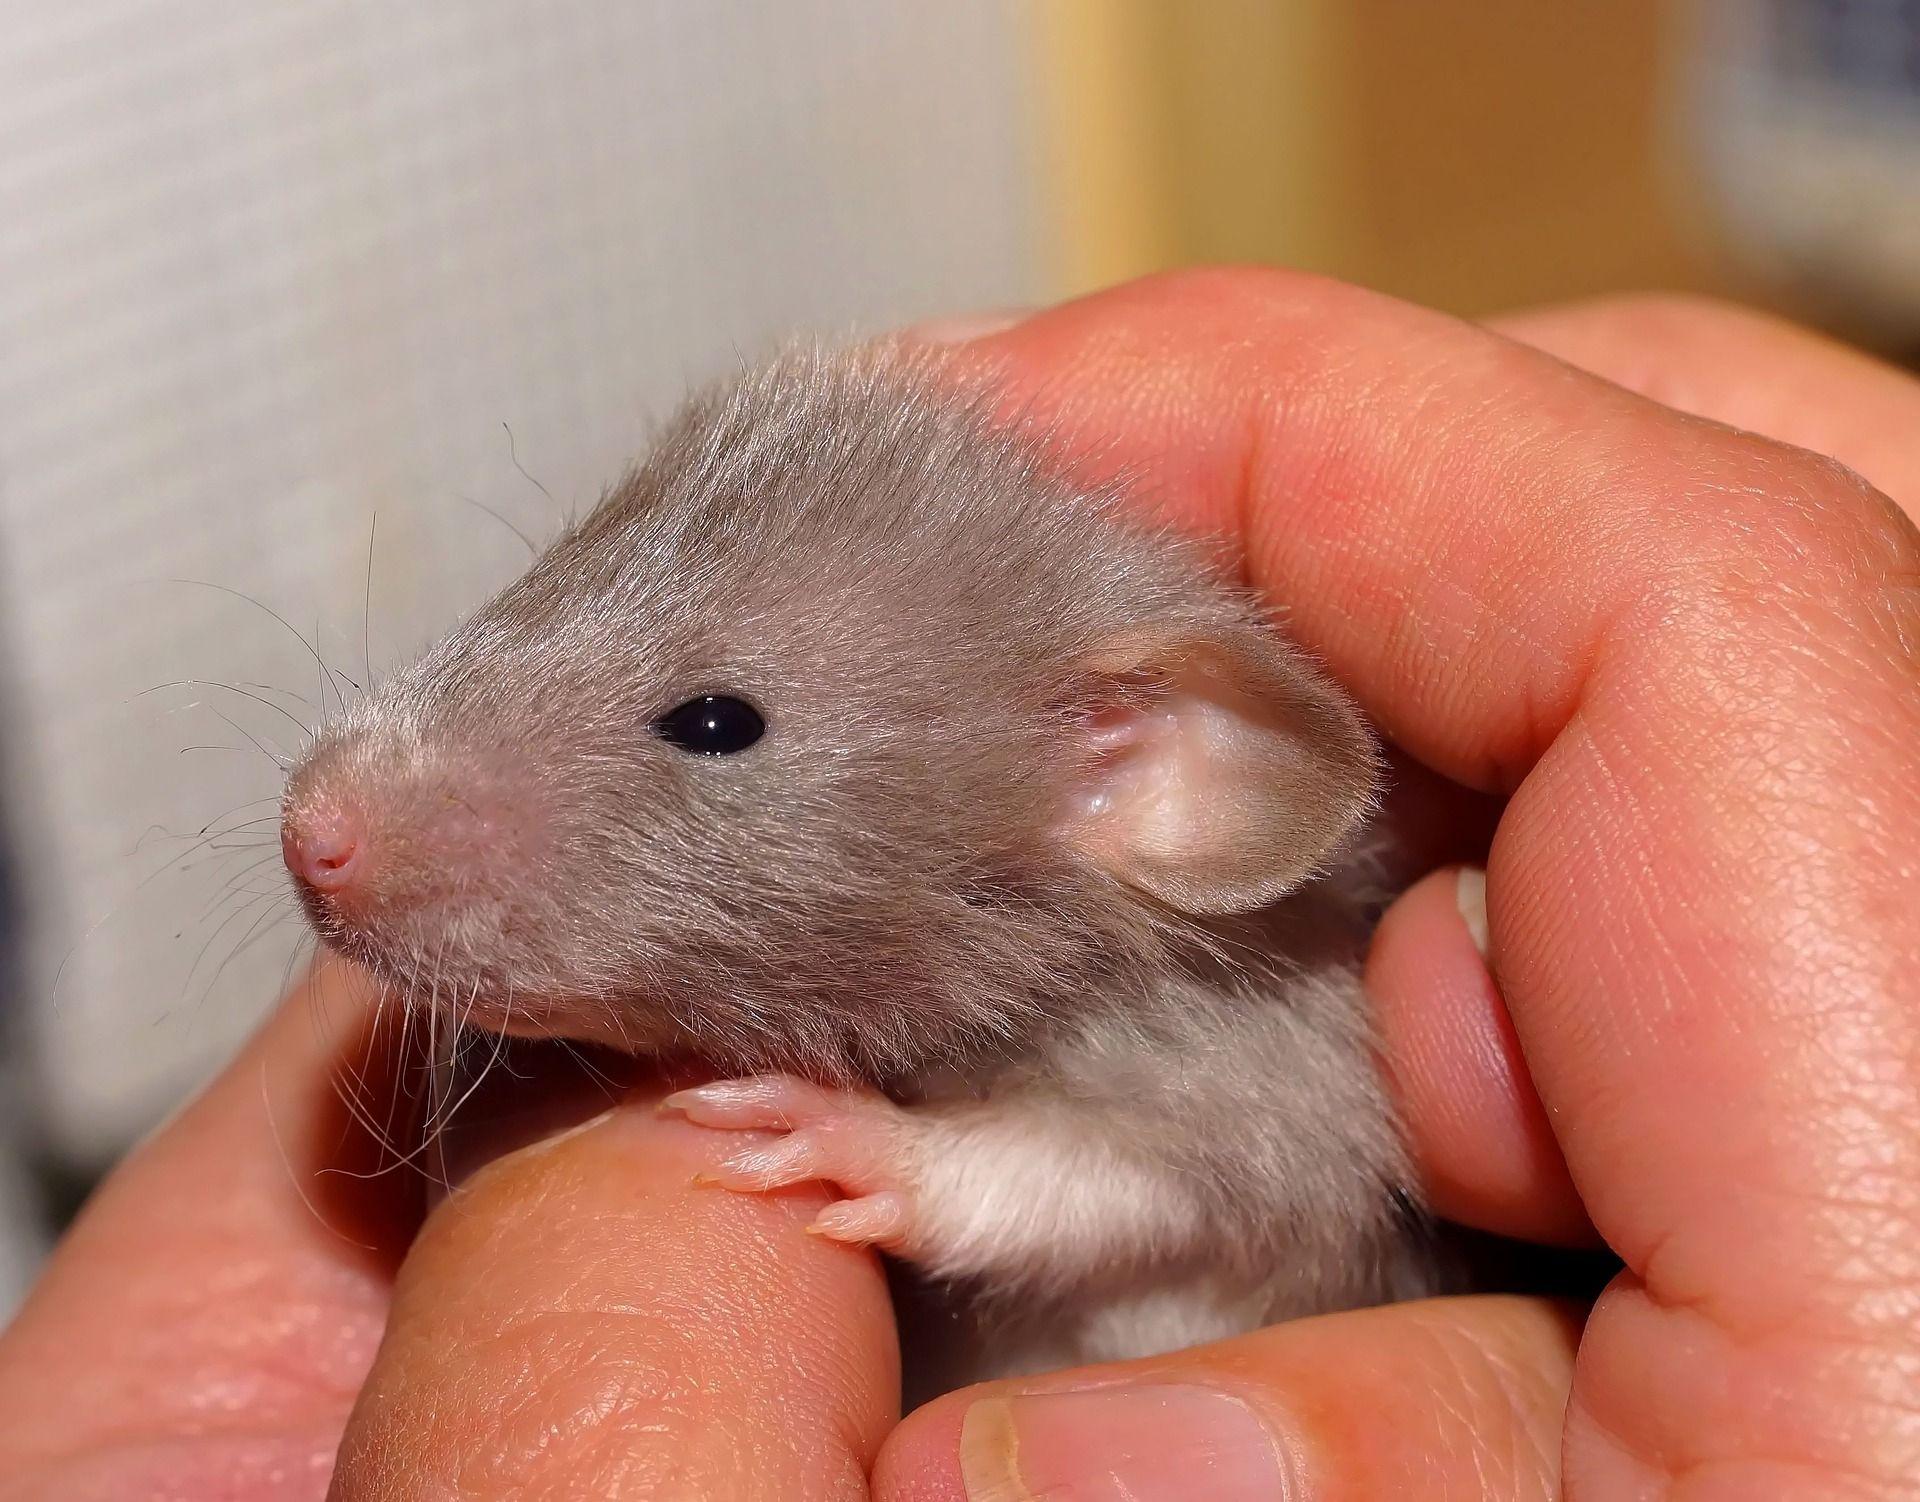 Ratte Baby Cute Farbratten Ratte Haustier Ausgestopftes Tier